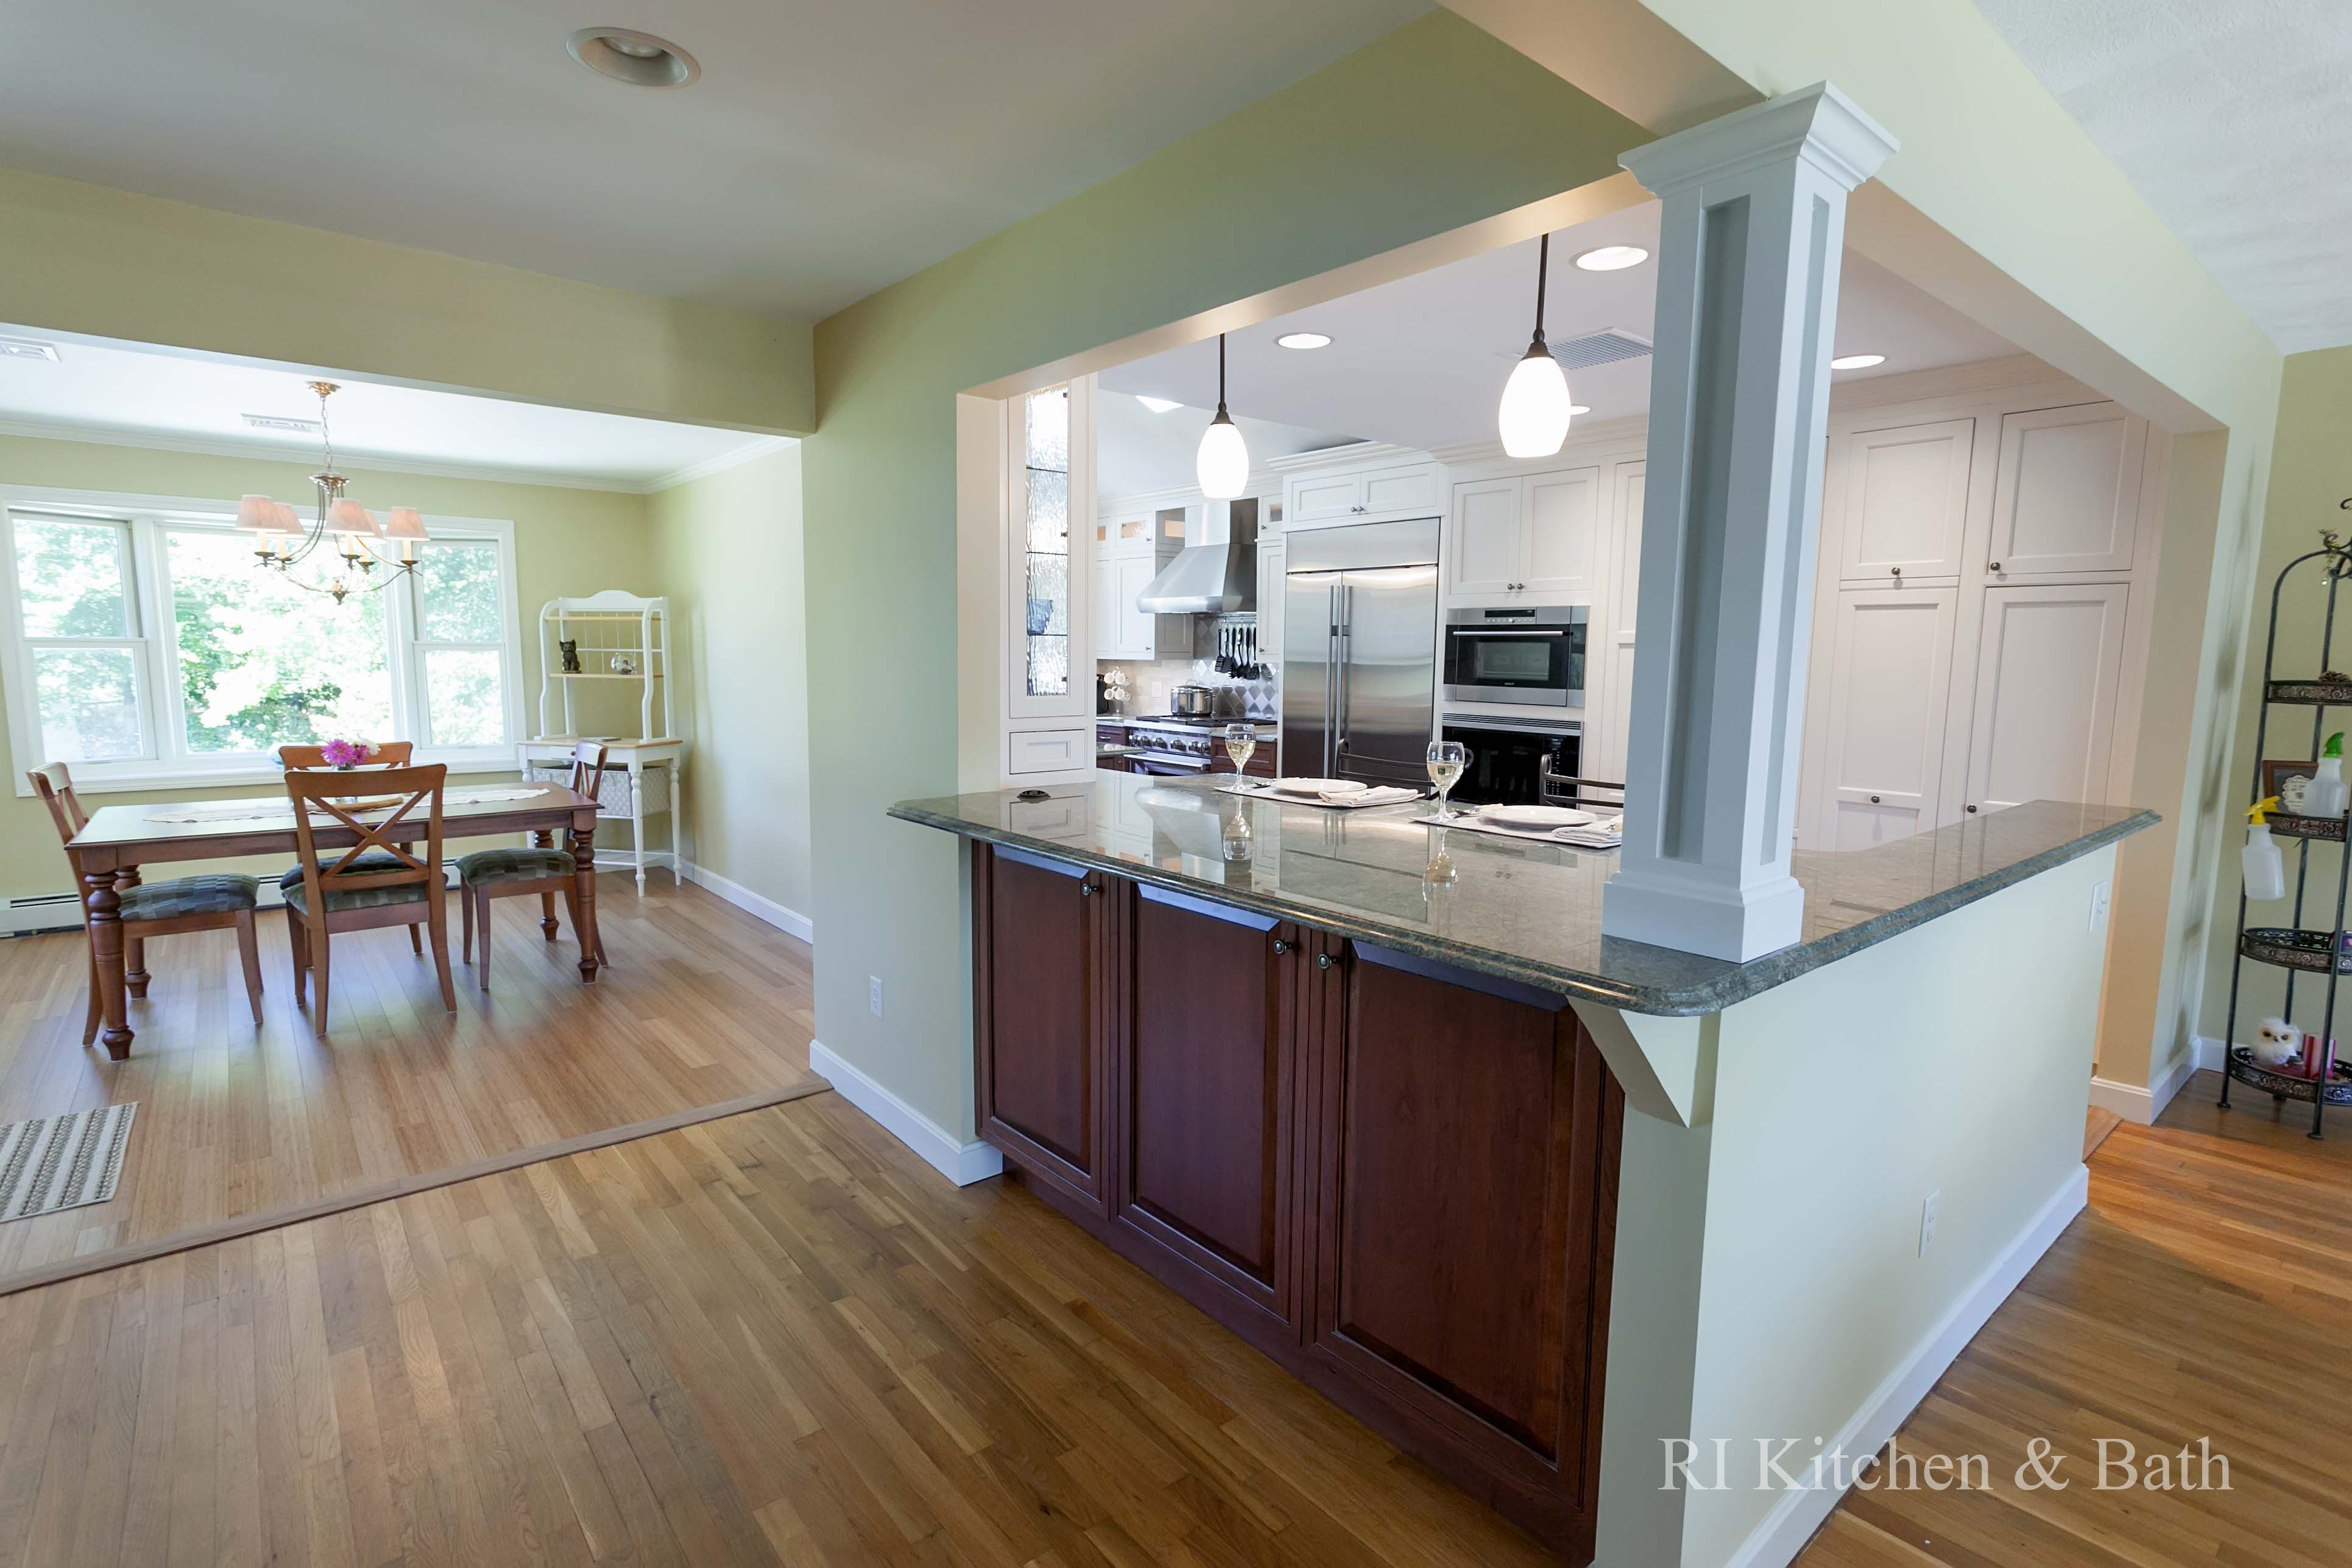 A Twotone Transitional Kitchen Design#rikb #kitchendesign Mesmerizing Transitional Kitchen Design Inspiration